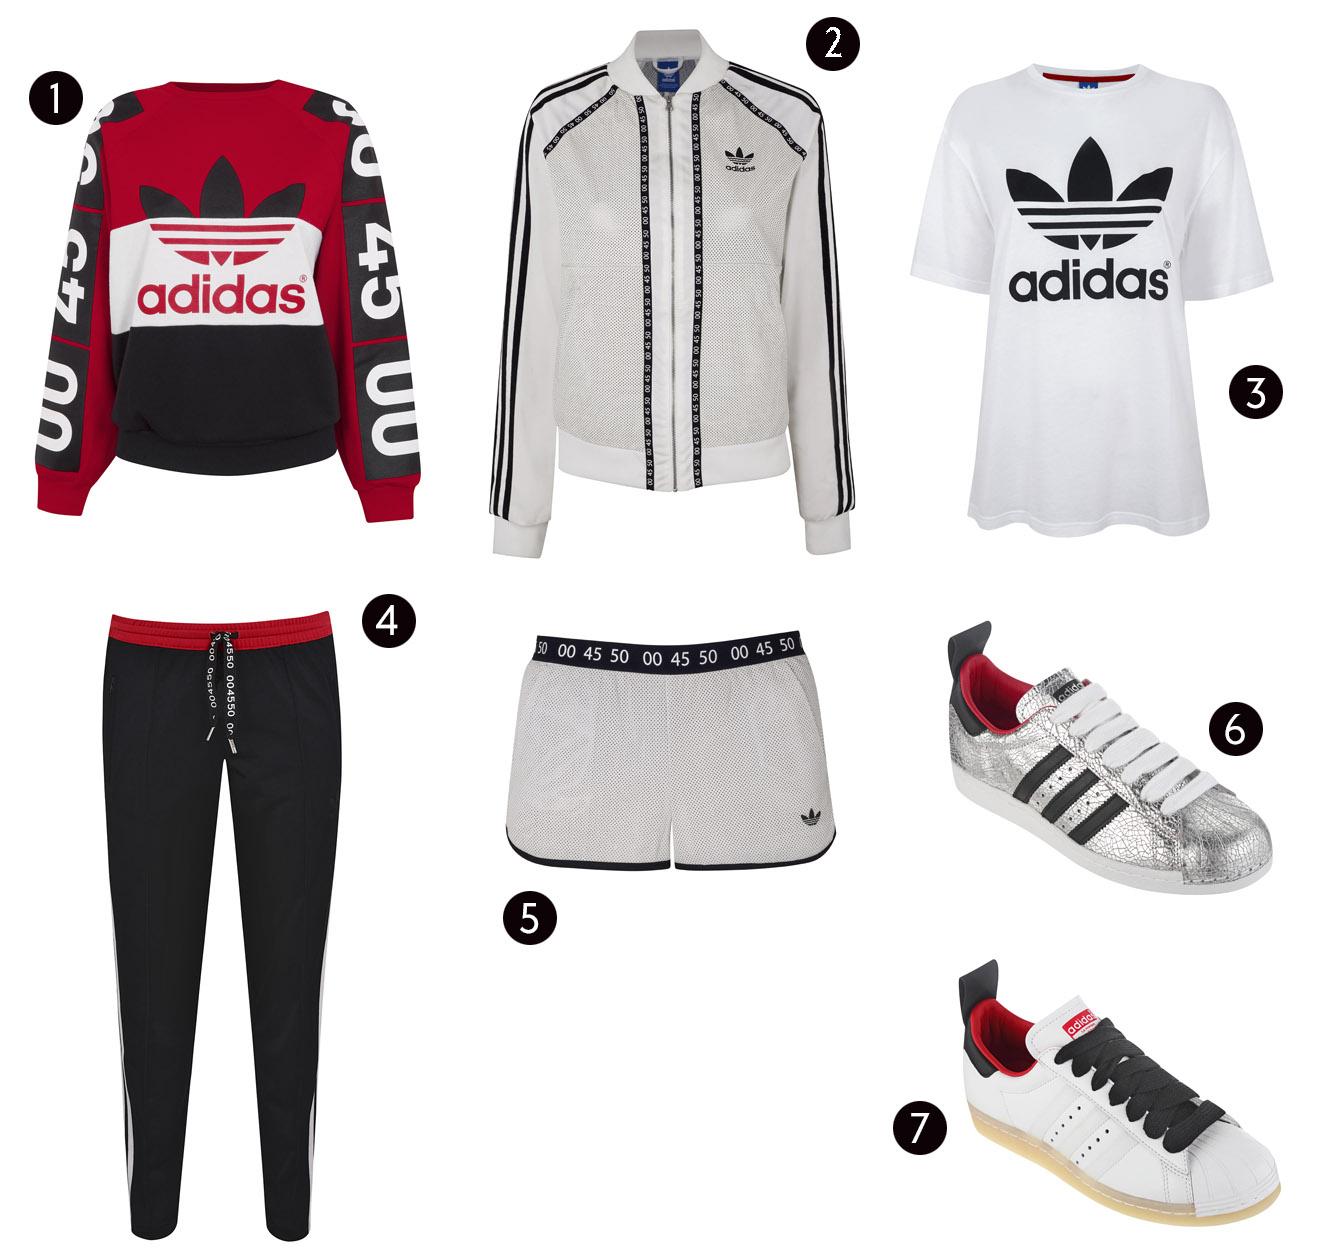 Adidas for topshop originals collection rare photo